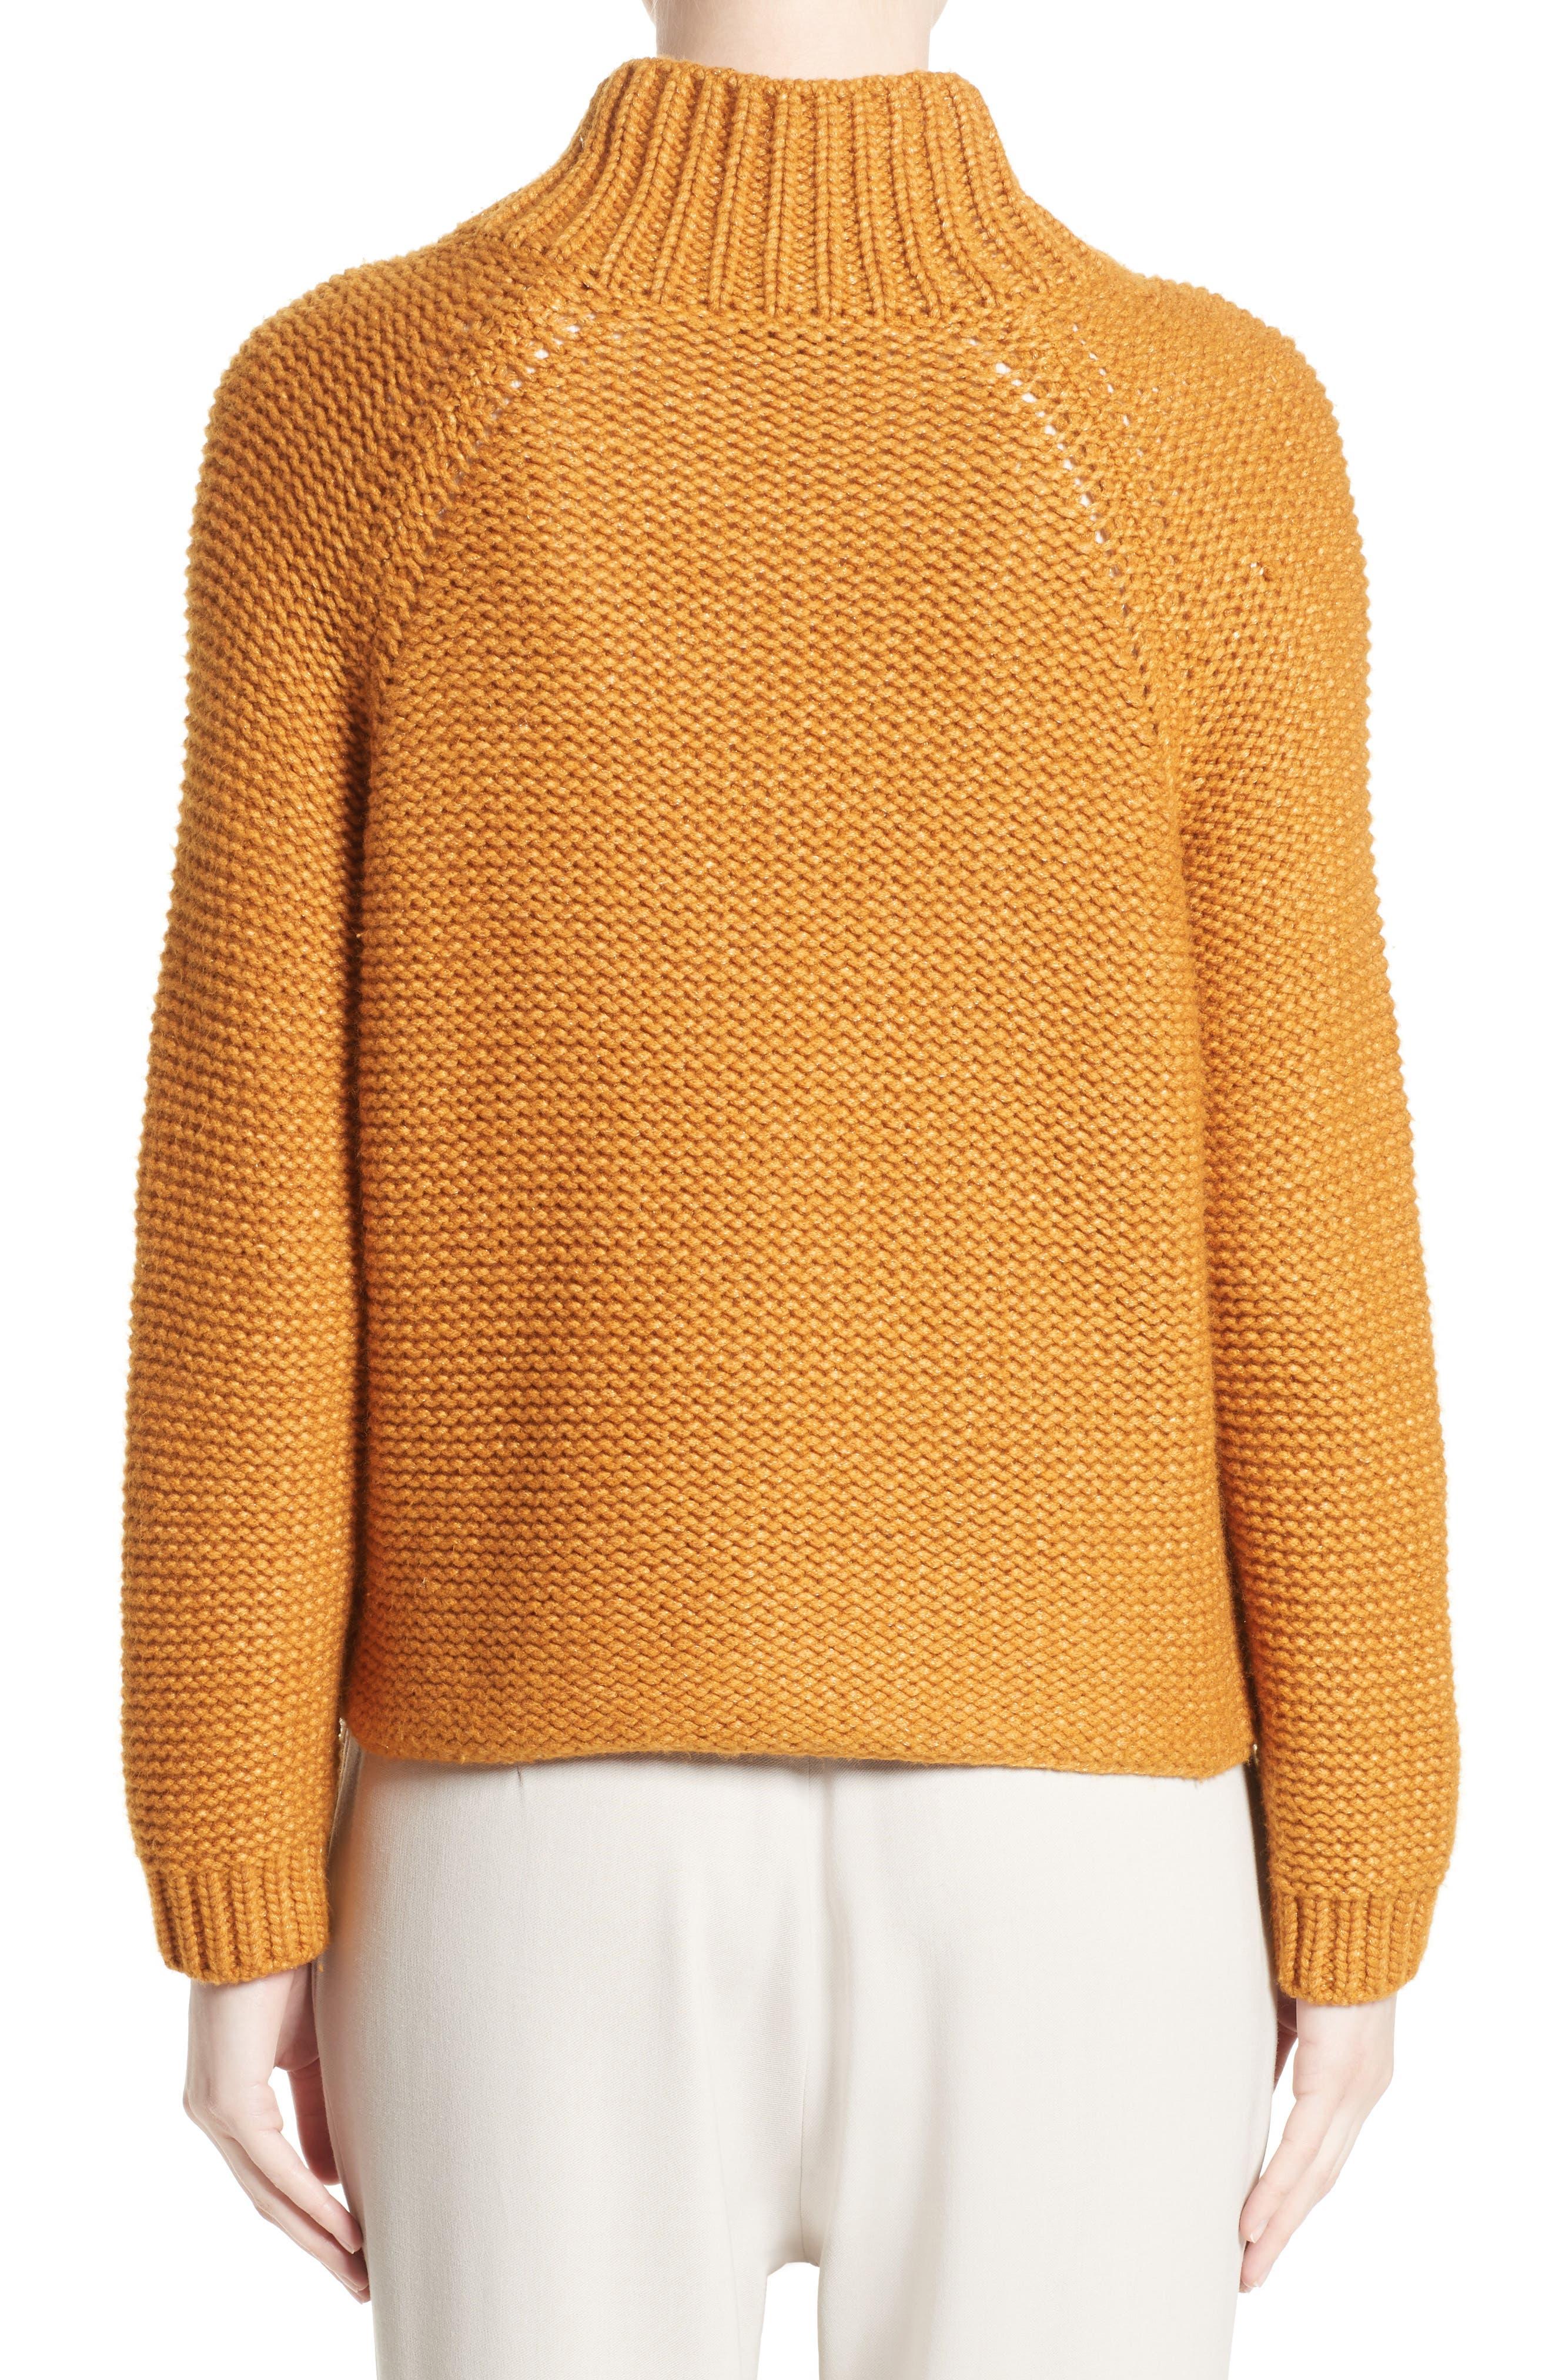 Alternate Image 2  - Fabiana Filippi Knit Wool Blend Cardigan